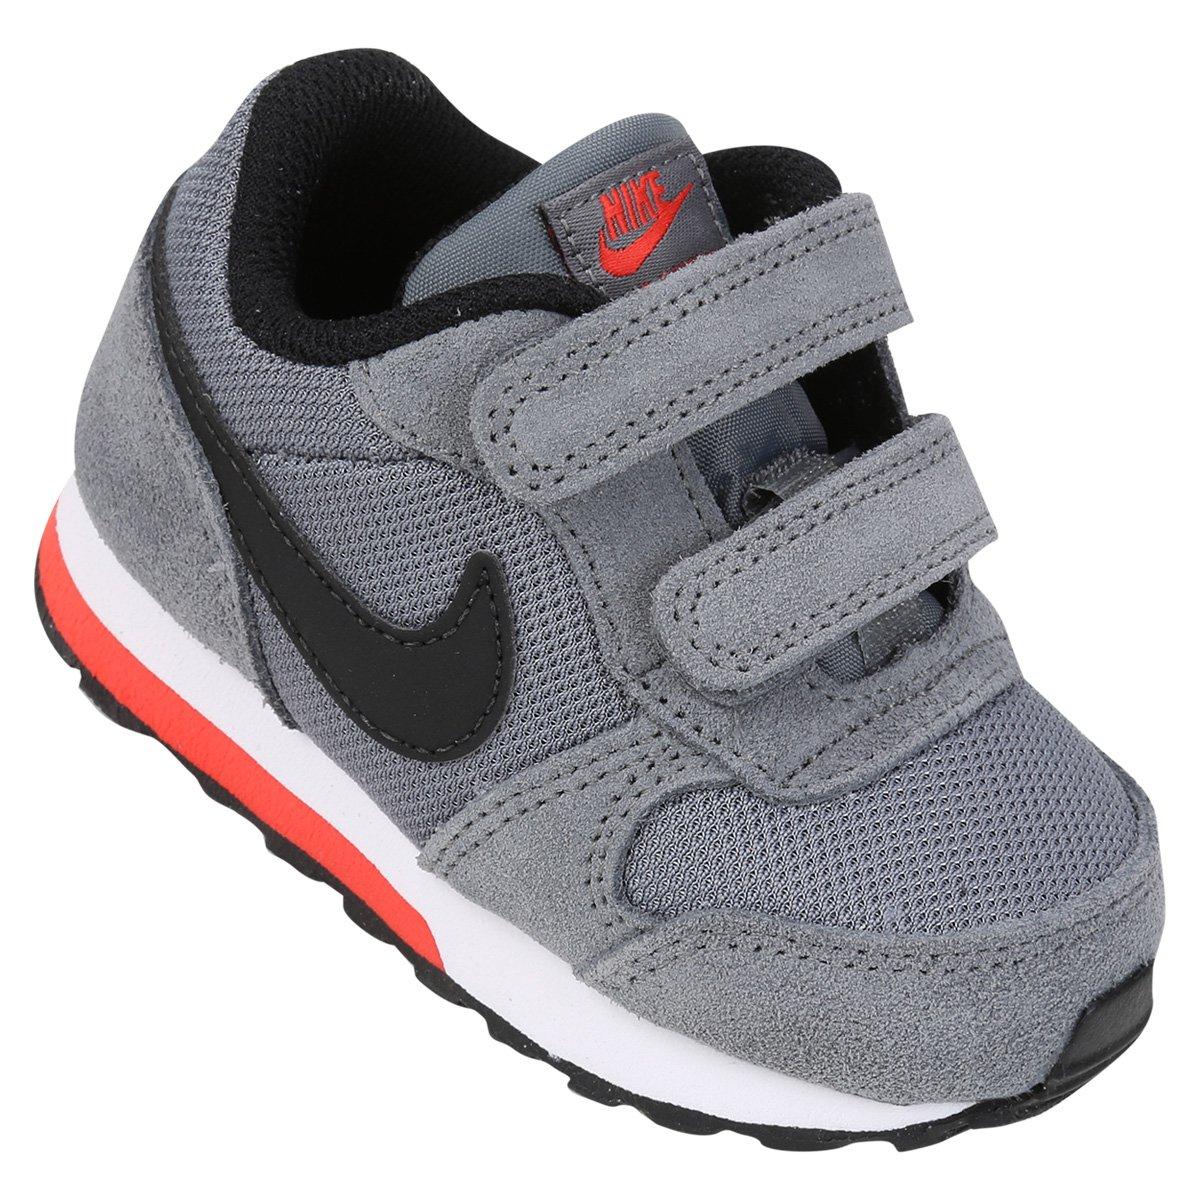 2d77ea79e80 Tênis Infantil Nike Mid Runner 2 - Cinza e Preto - Compre Agora ...